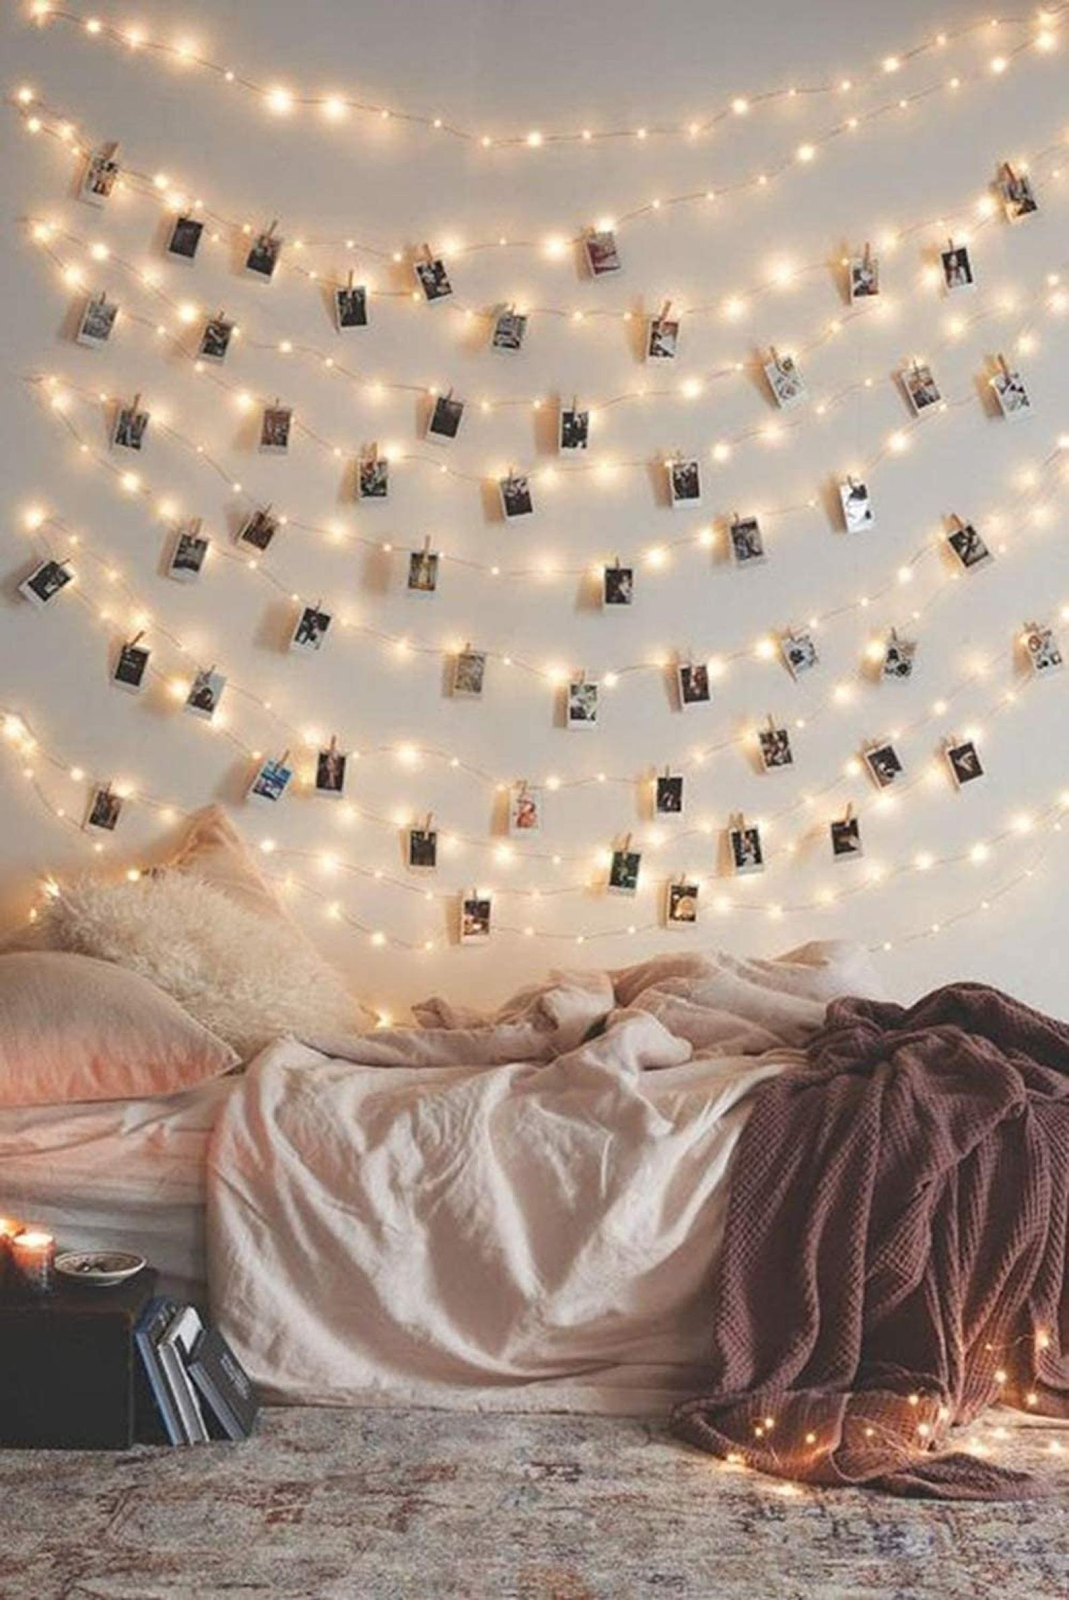 LEEDString Lights for Photos